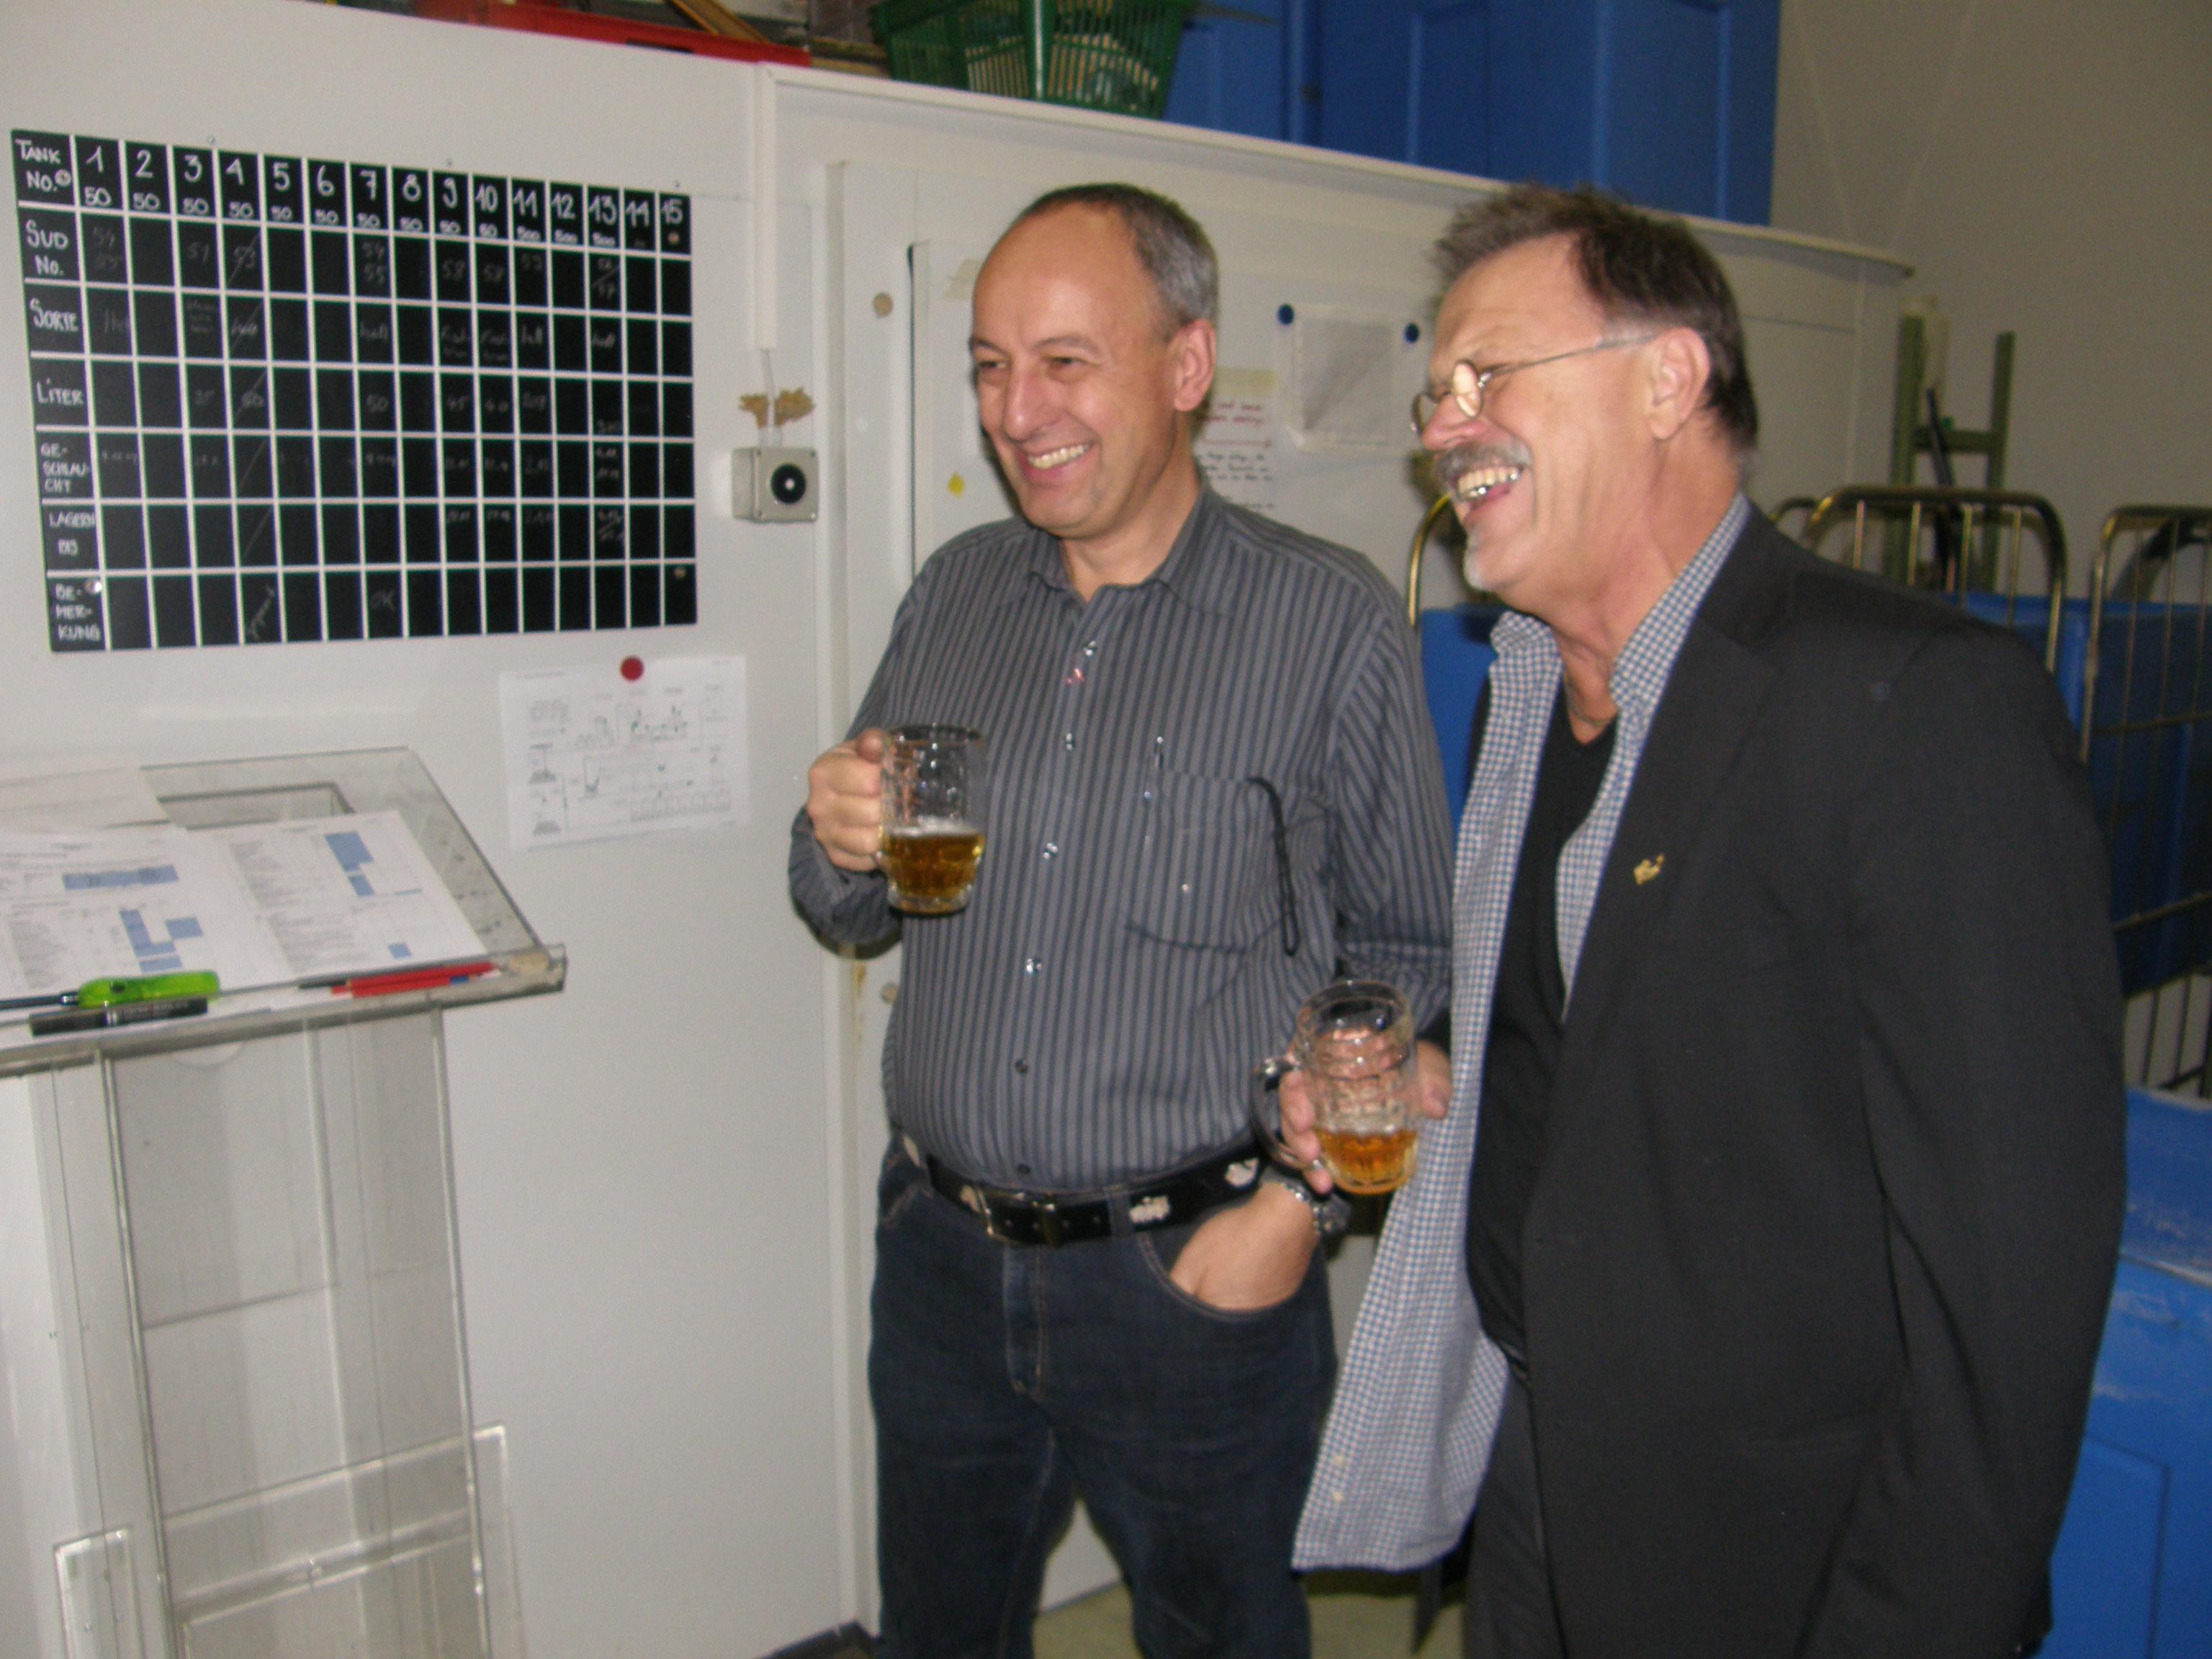 2009 Brausemiar mit Eglizunft